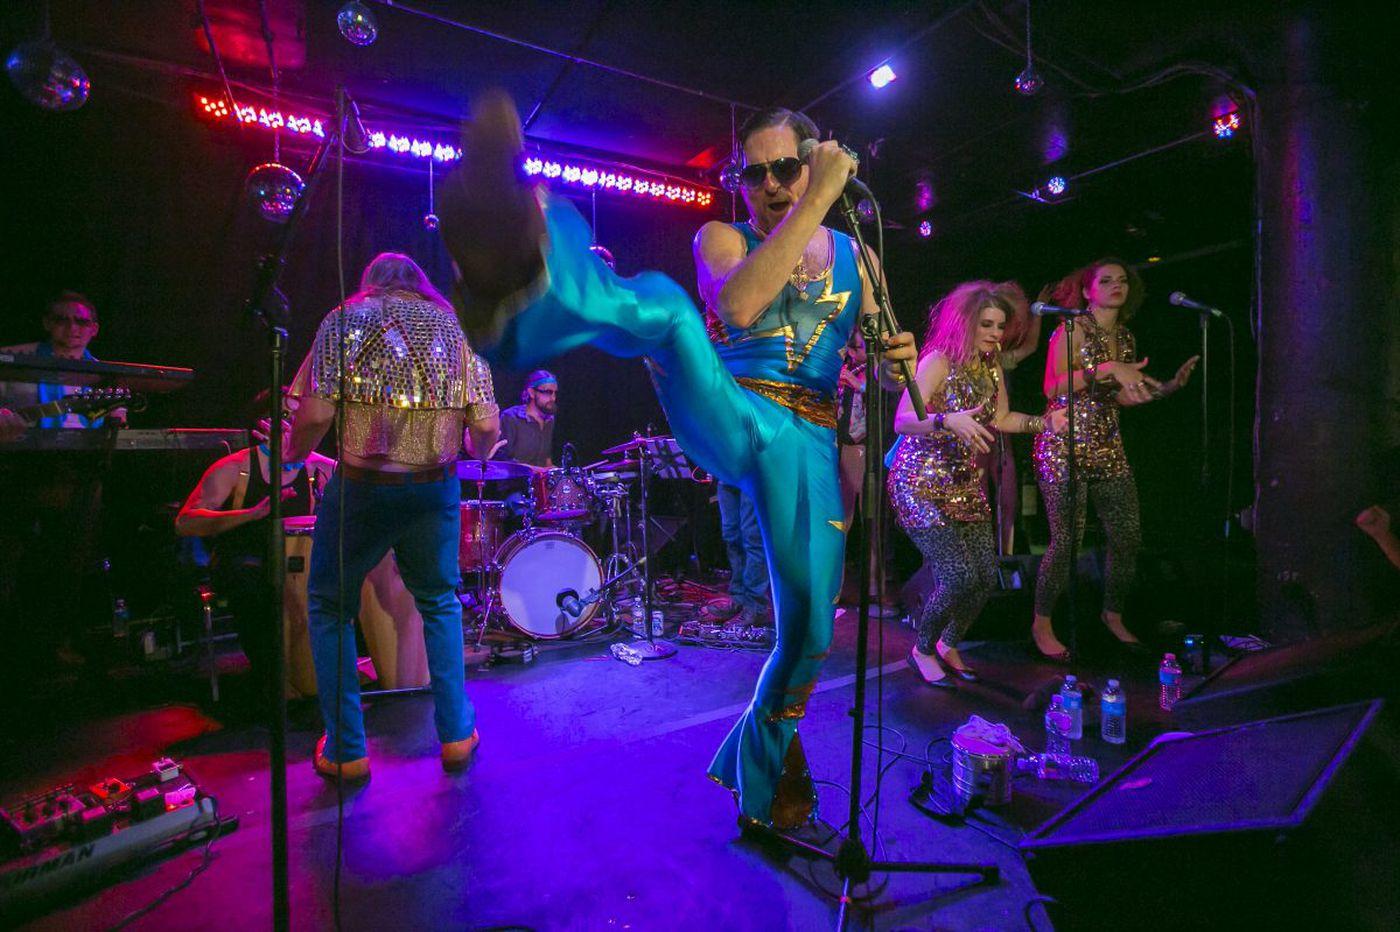 Philly's favorite funkadelic lounge singer turns to children's music